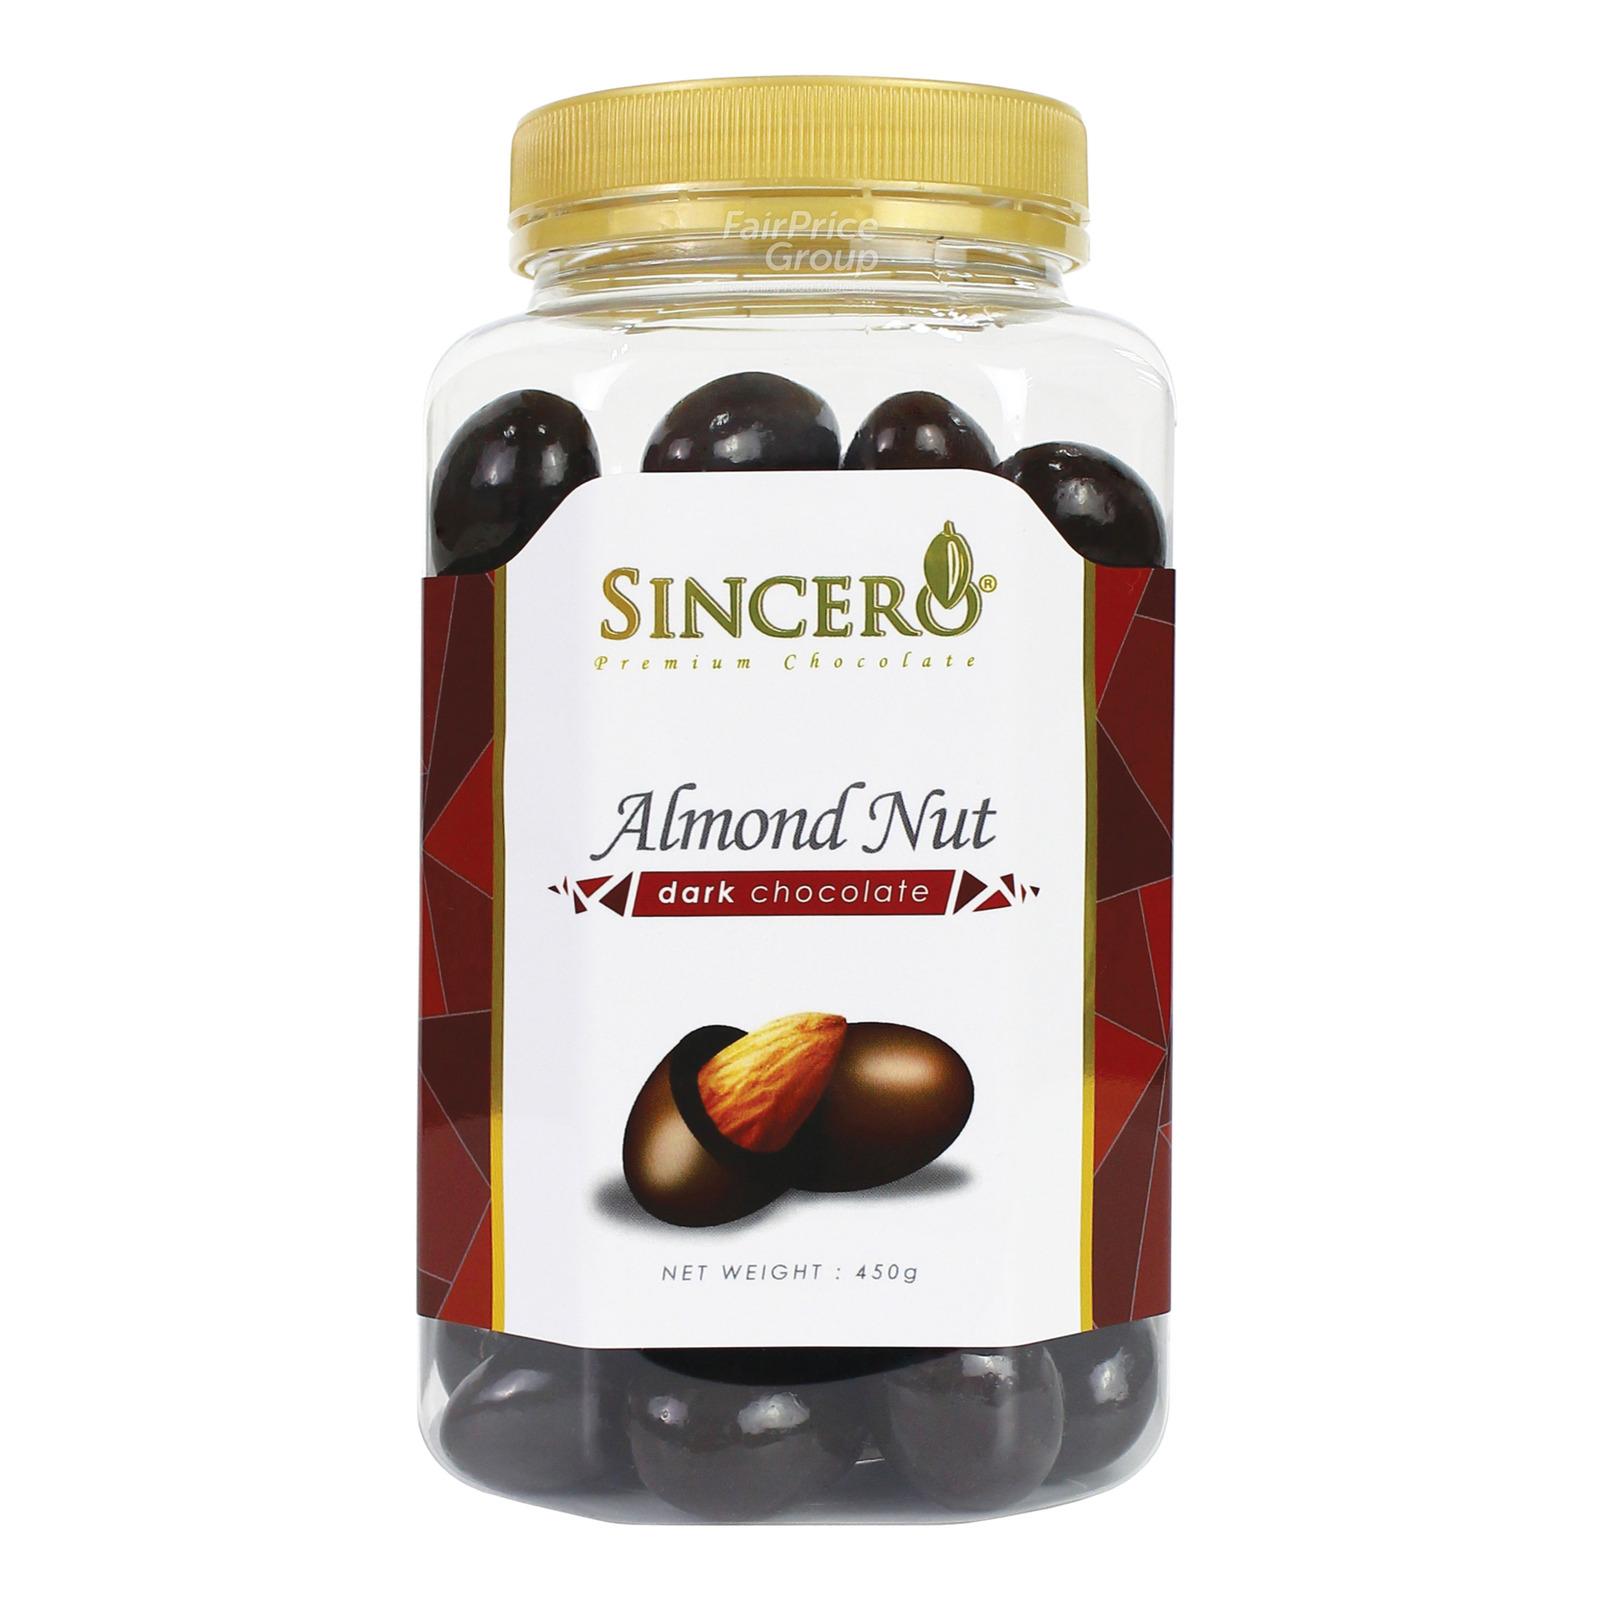 Sincero Dark Chocolate - Almond Nut